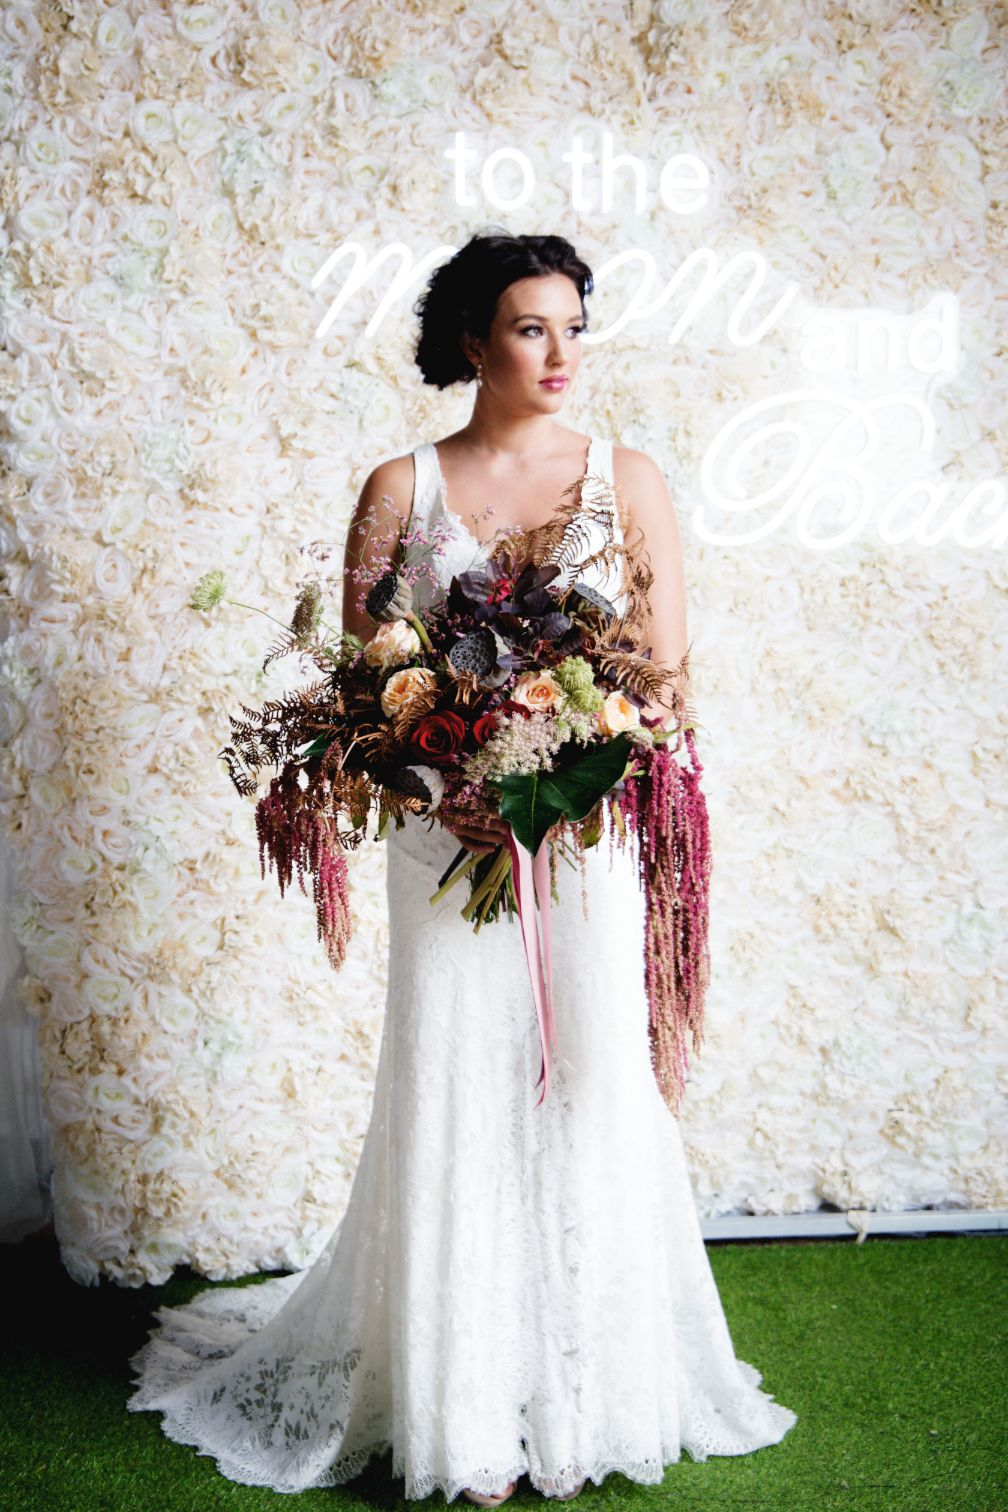 STYLED: RUSTIC BOHEMIAN BARN WEDDING IDEAS   INSPIRATION SHOOT HUNTER REGION NSW